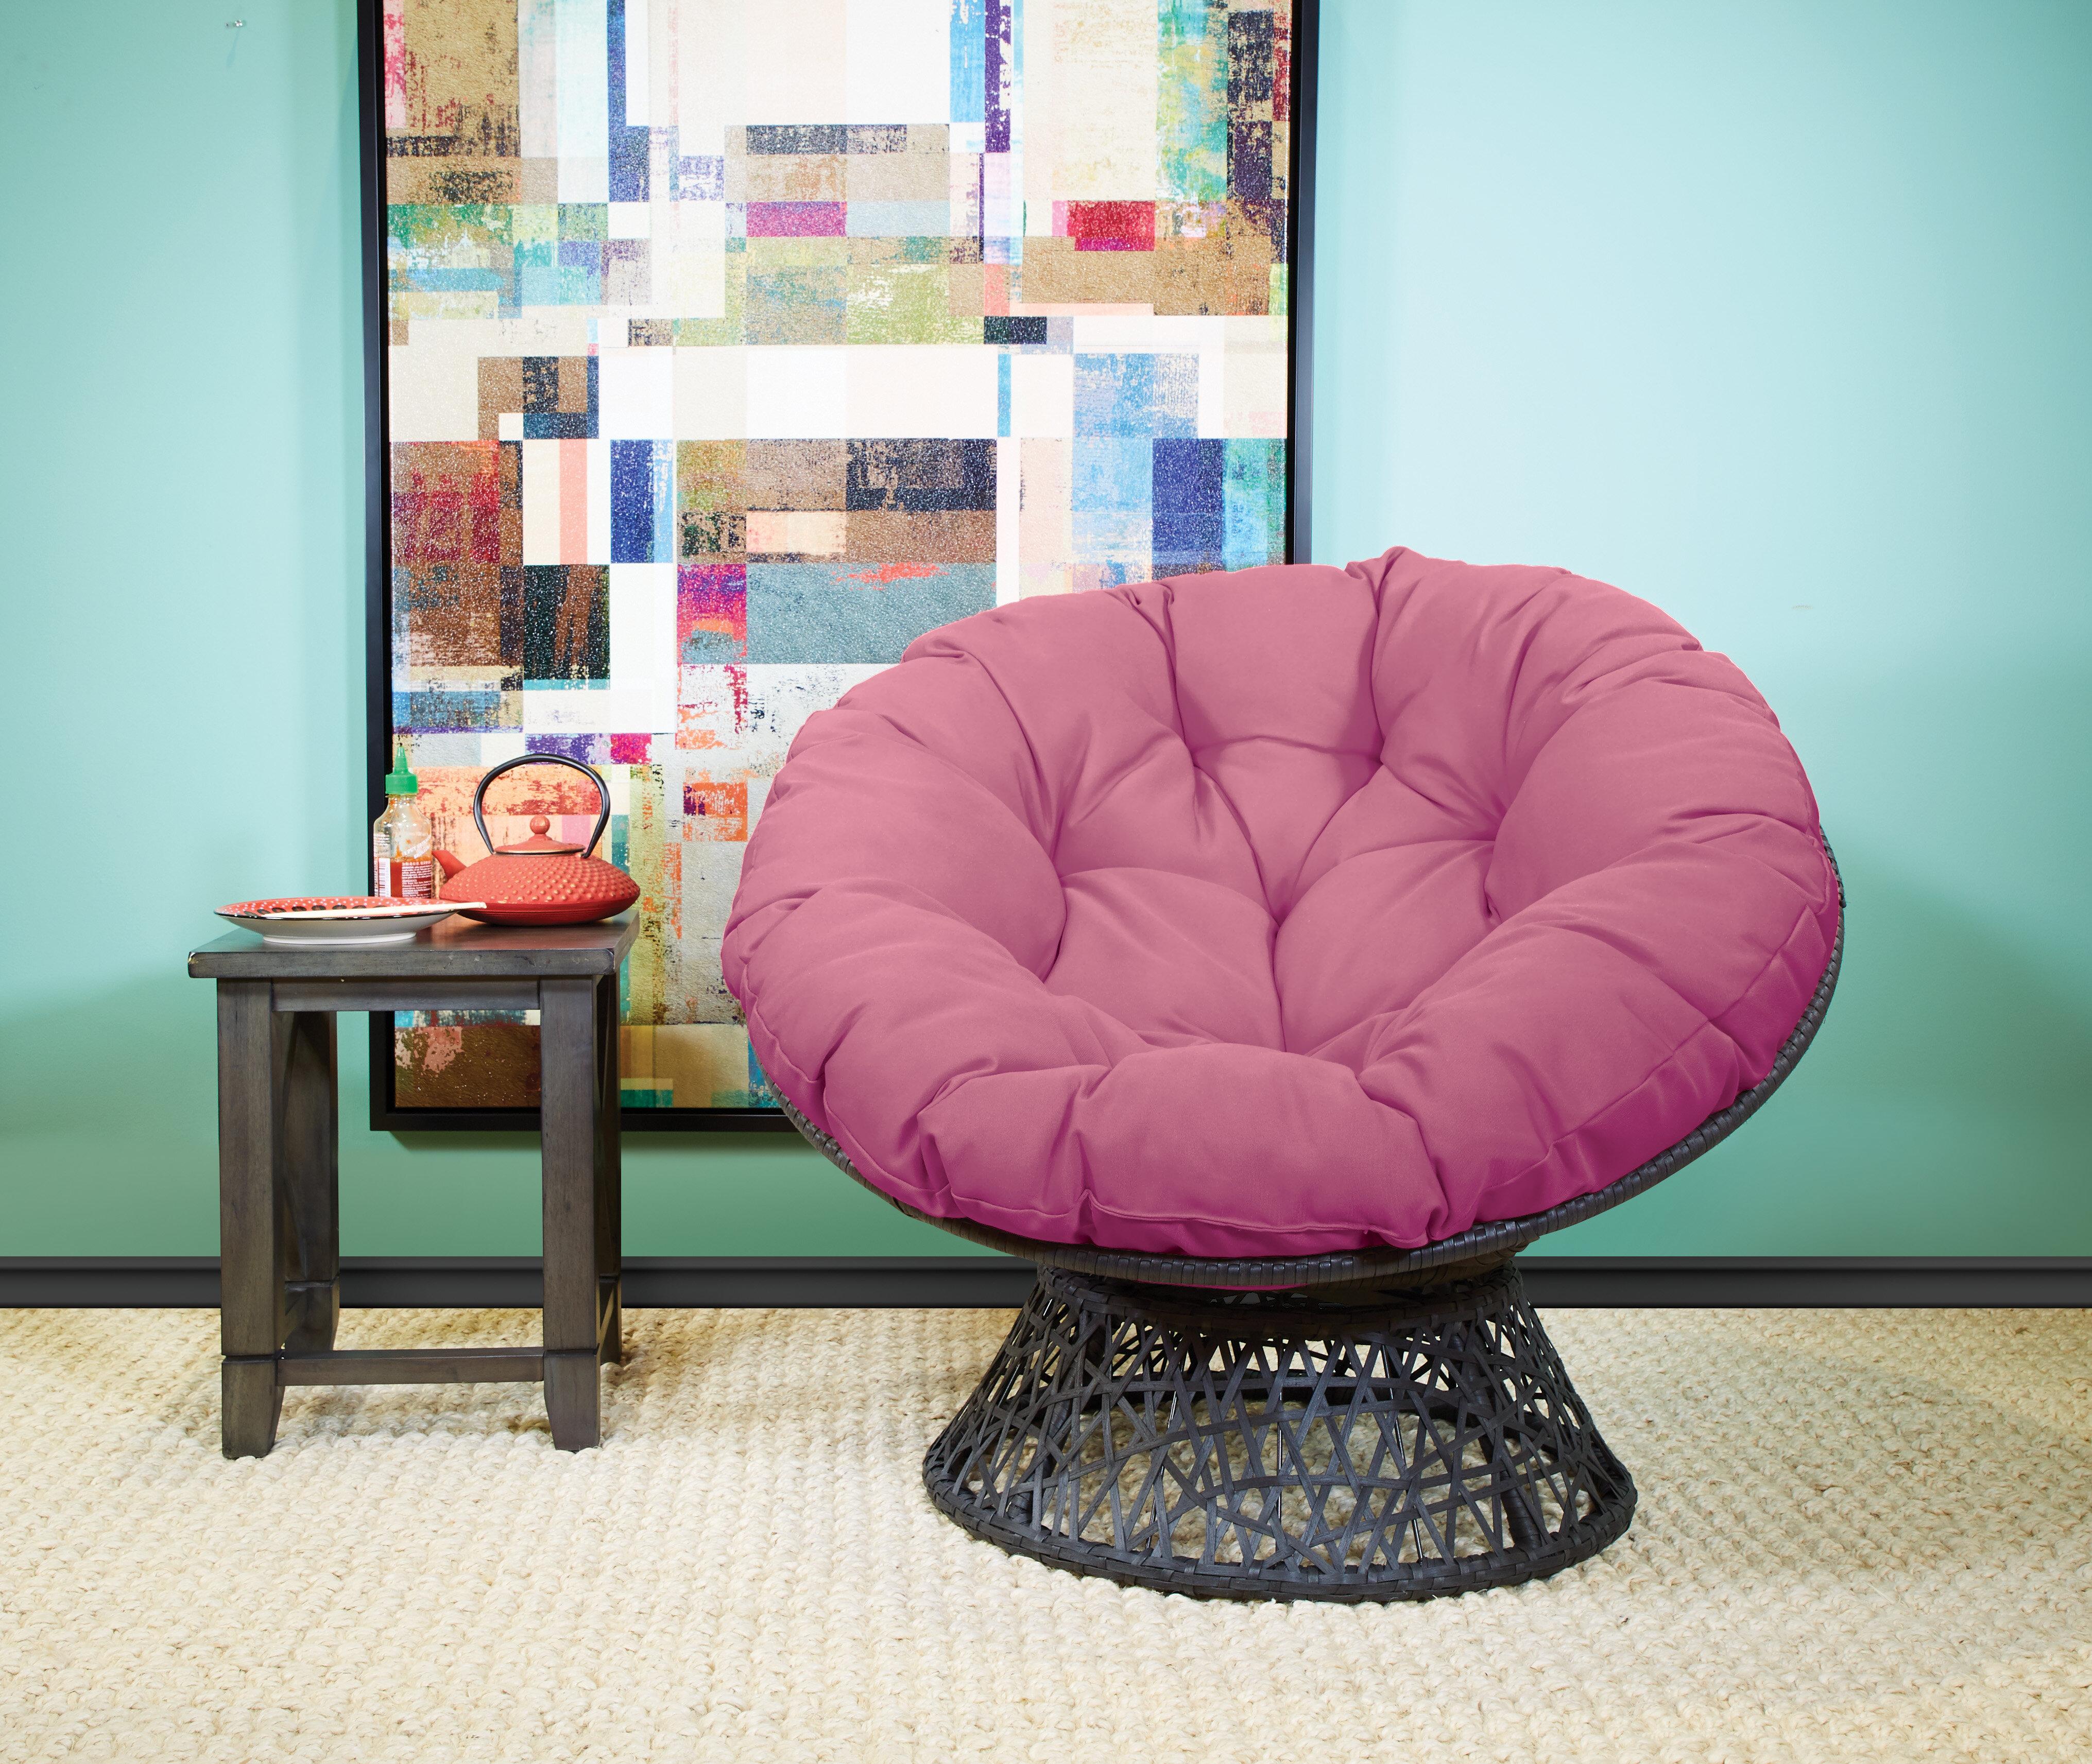 Papasan Purple Accent Chairs You Ll Love In 2021 Wayfair